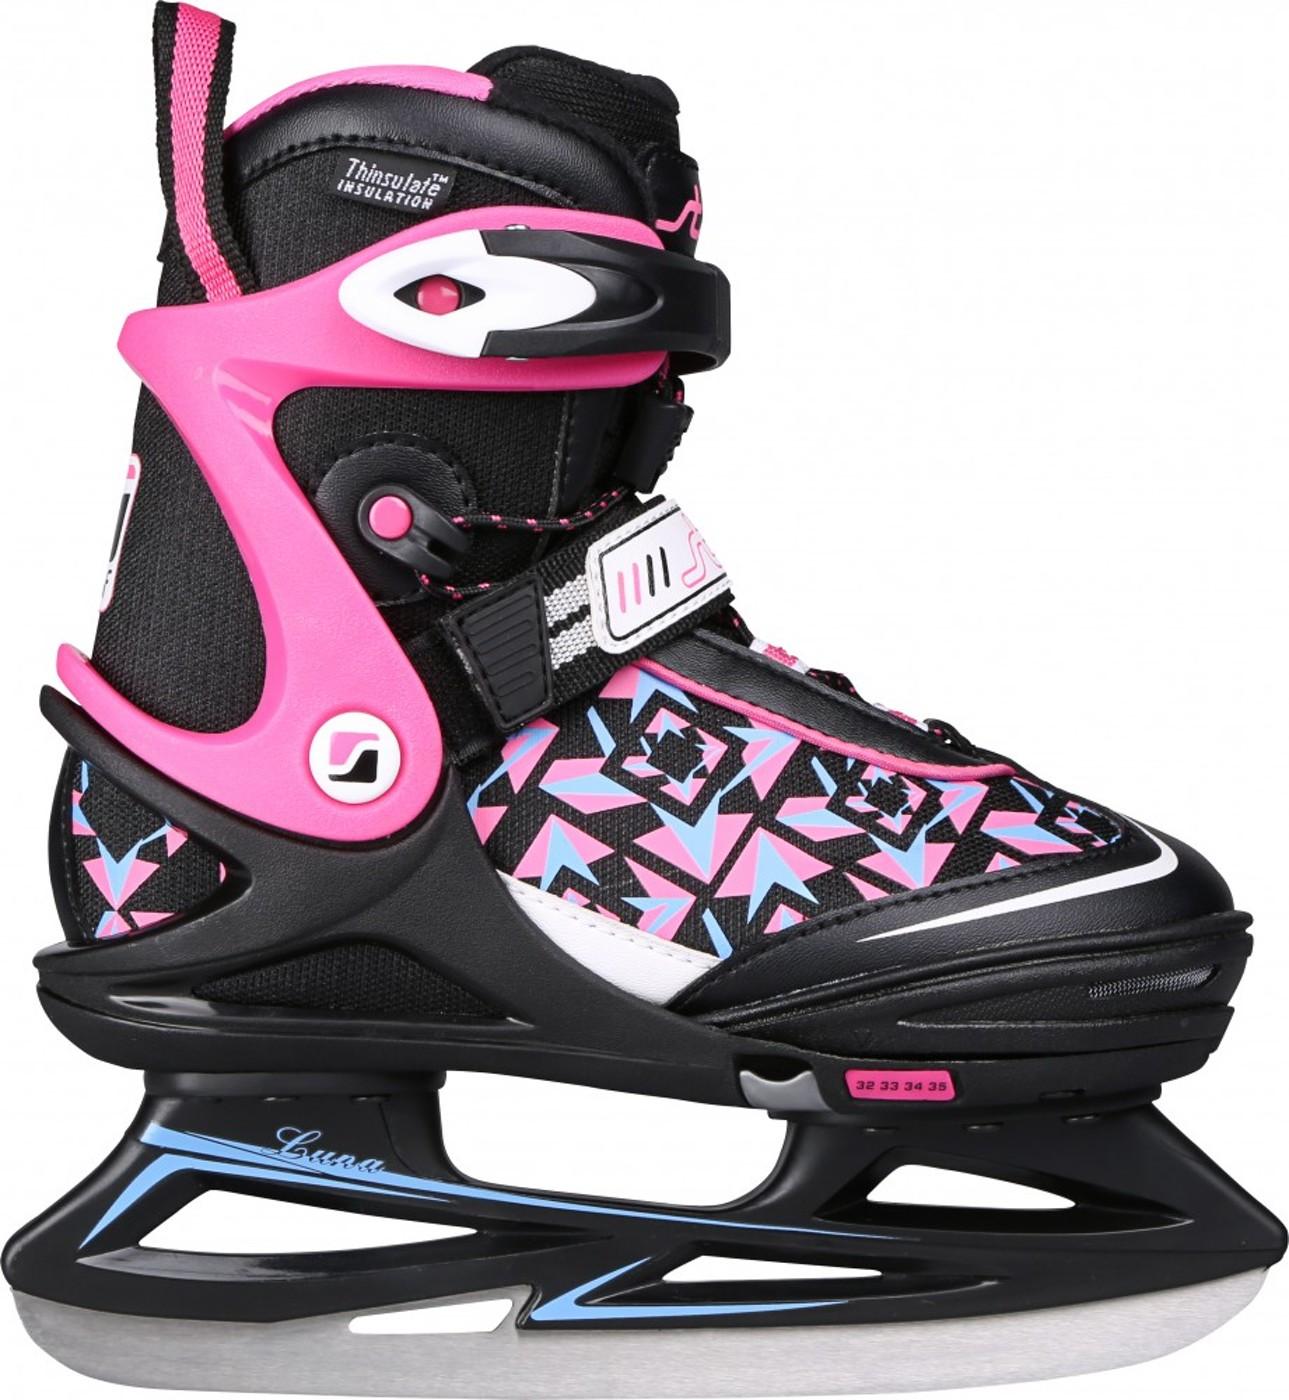 STUF Hockeyschuh LUNA - Kinder